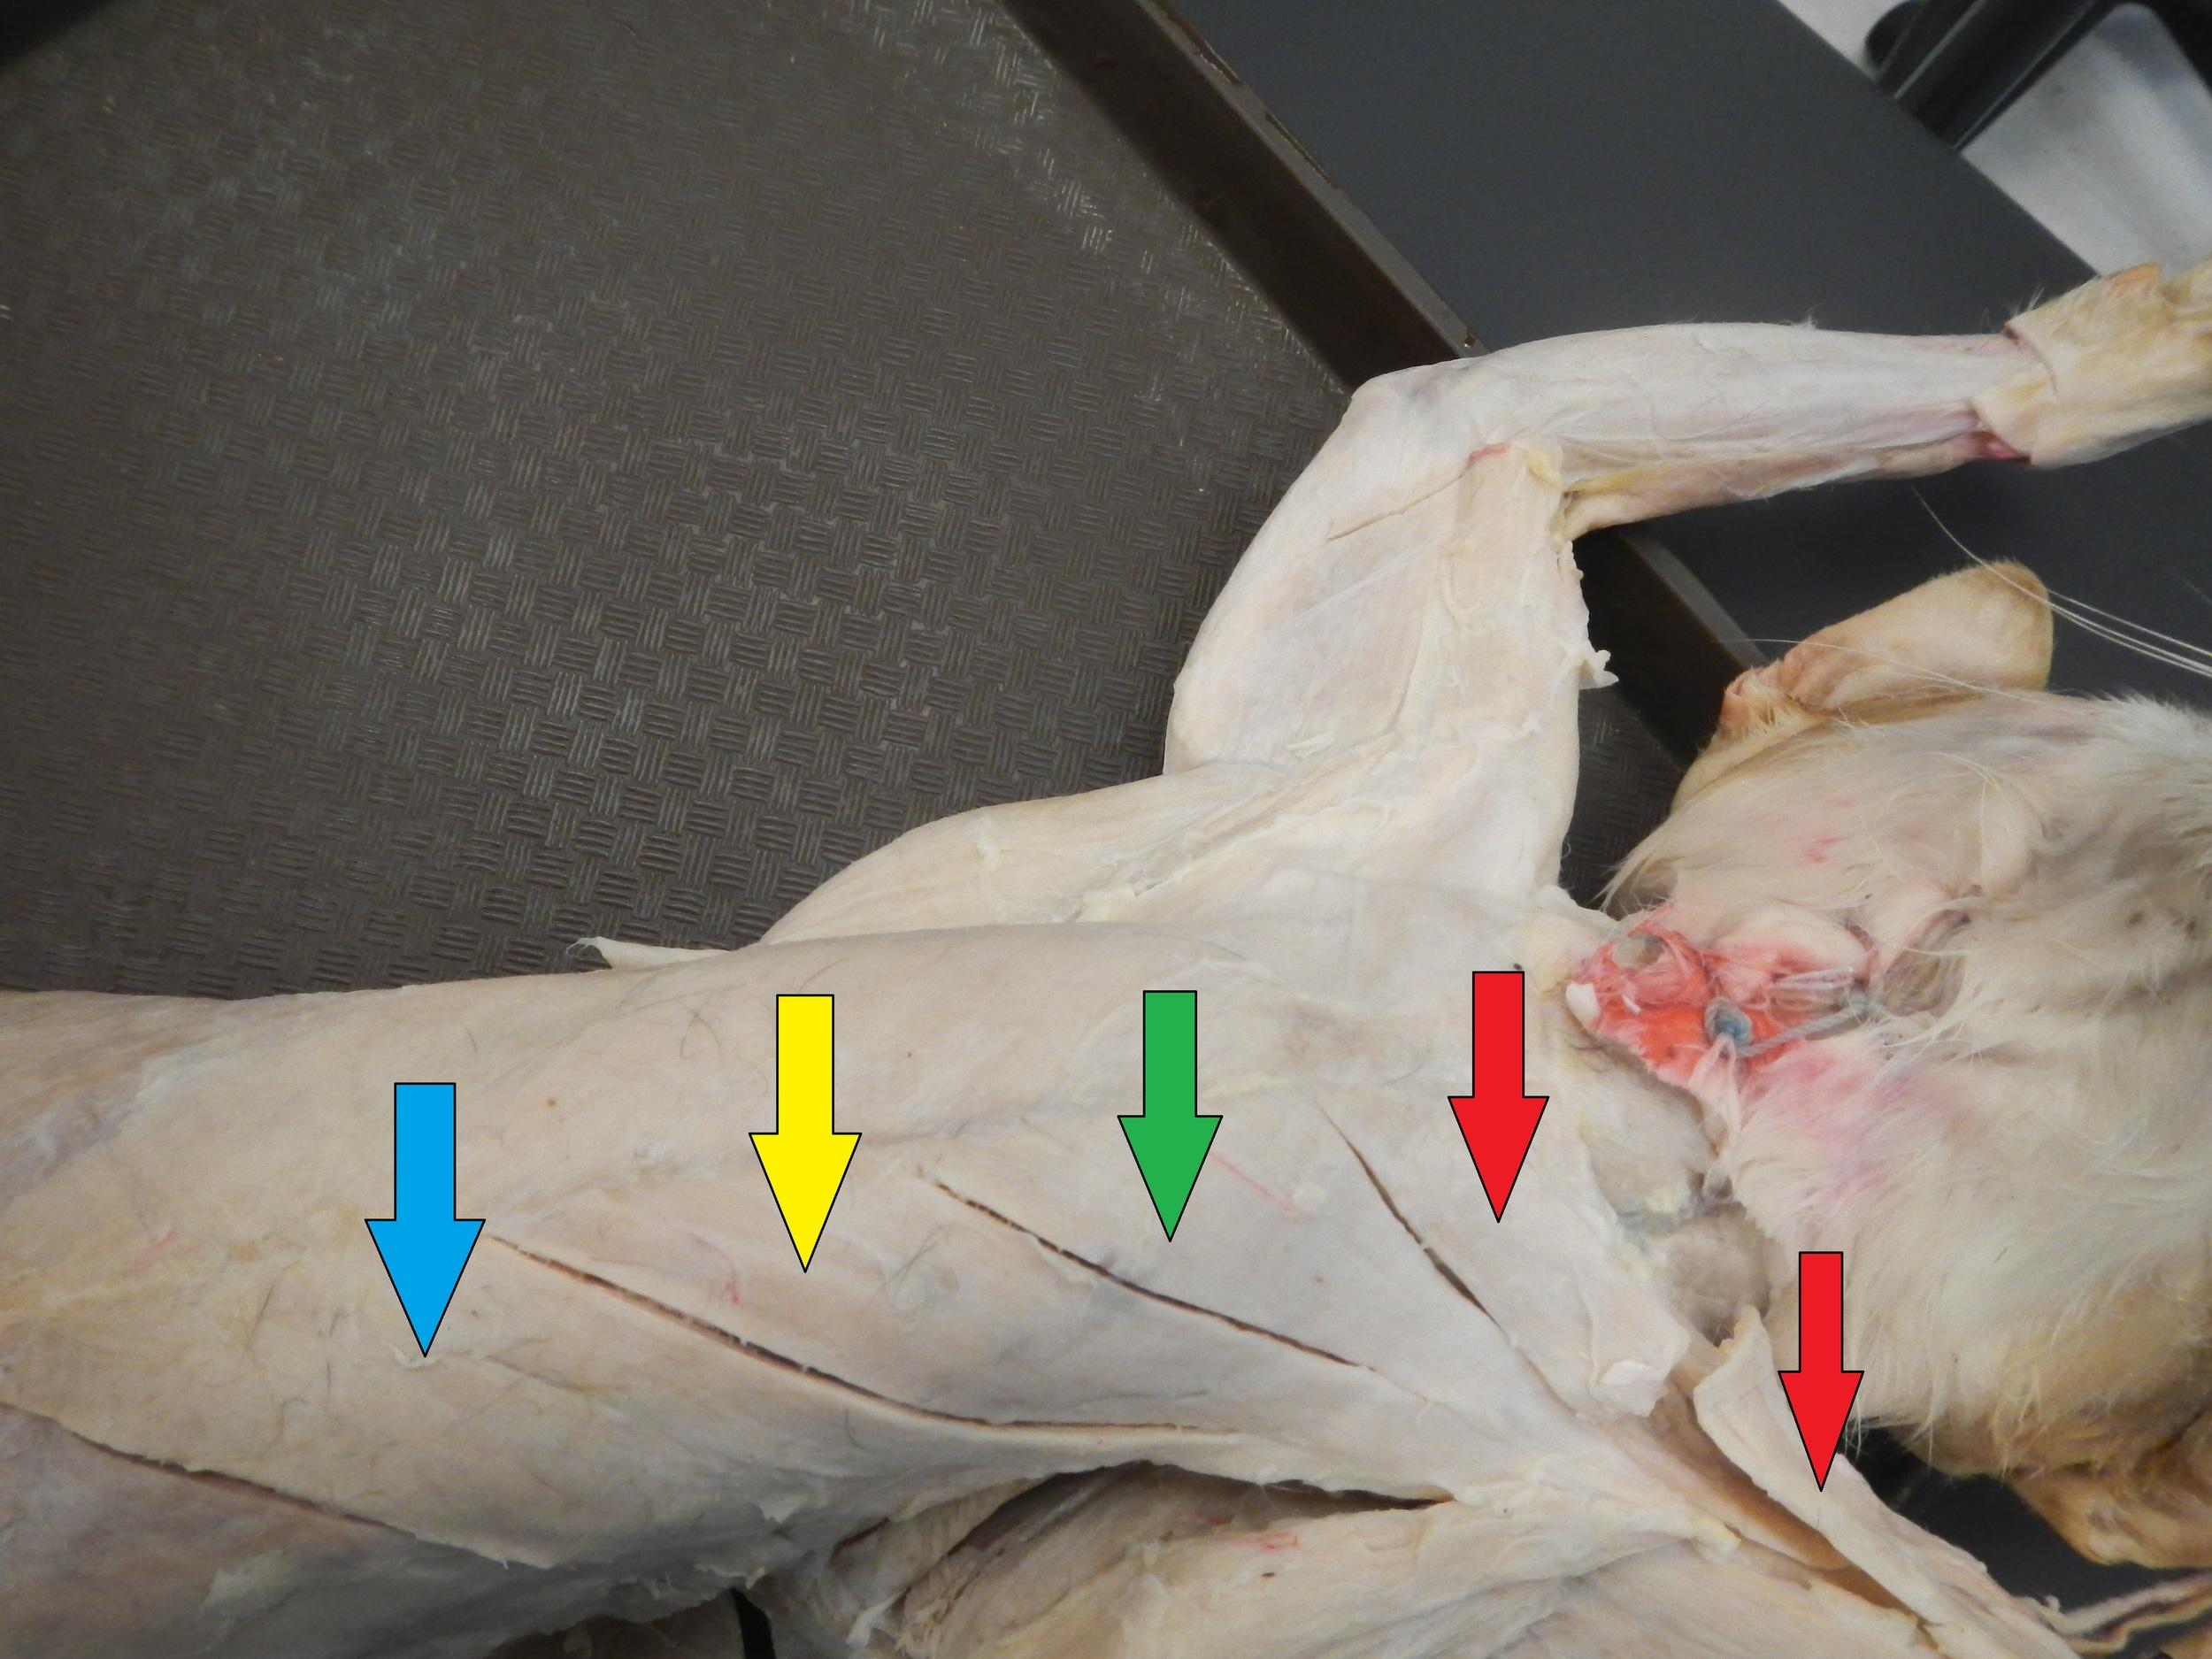 Chest Musculature:    Blue: Xiphihumeralis    Yellow: Pectoralis Minor    Green: Pectoralis Major    Red: Pectoantebrachialis